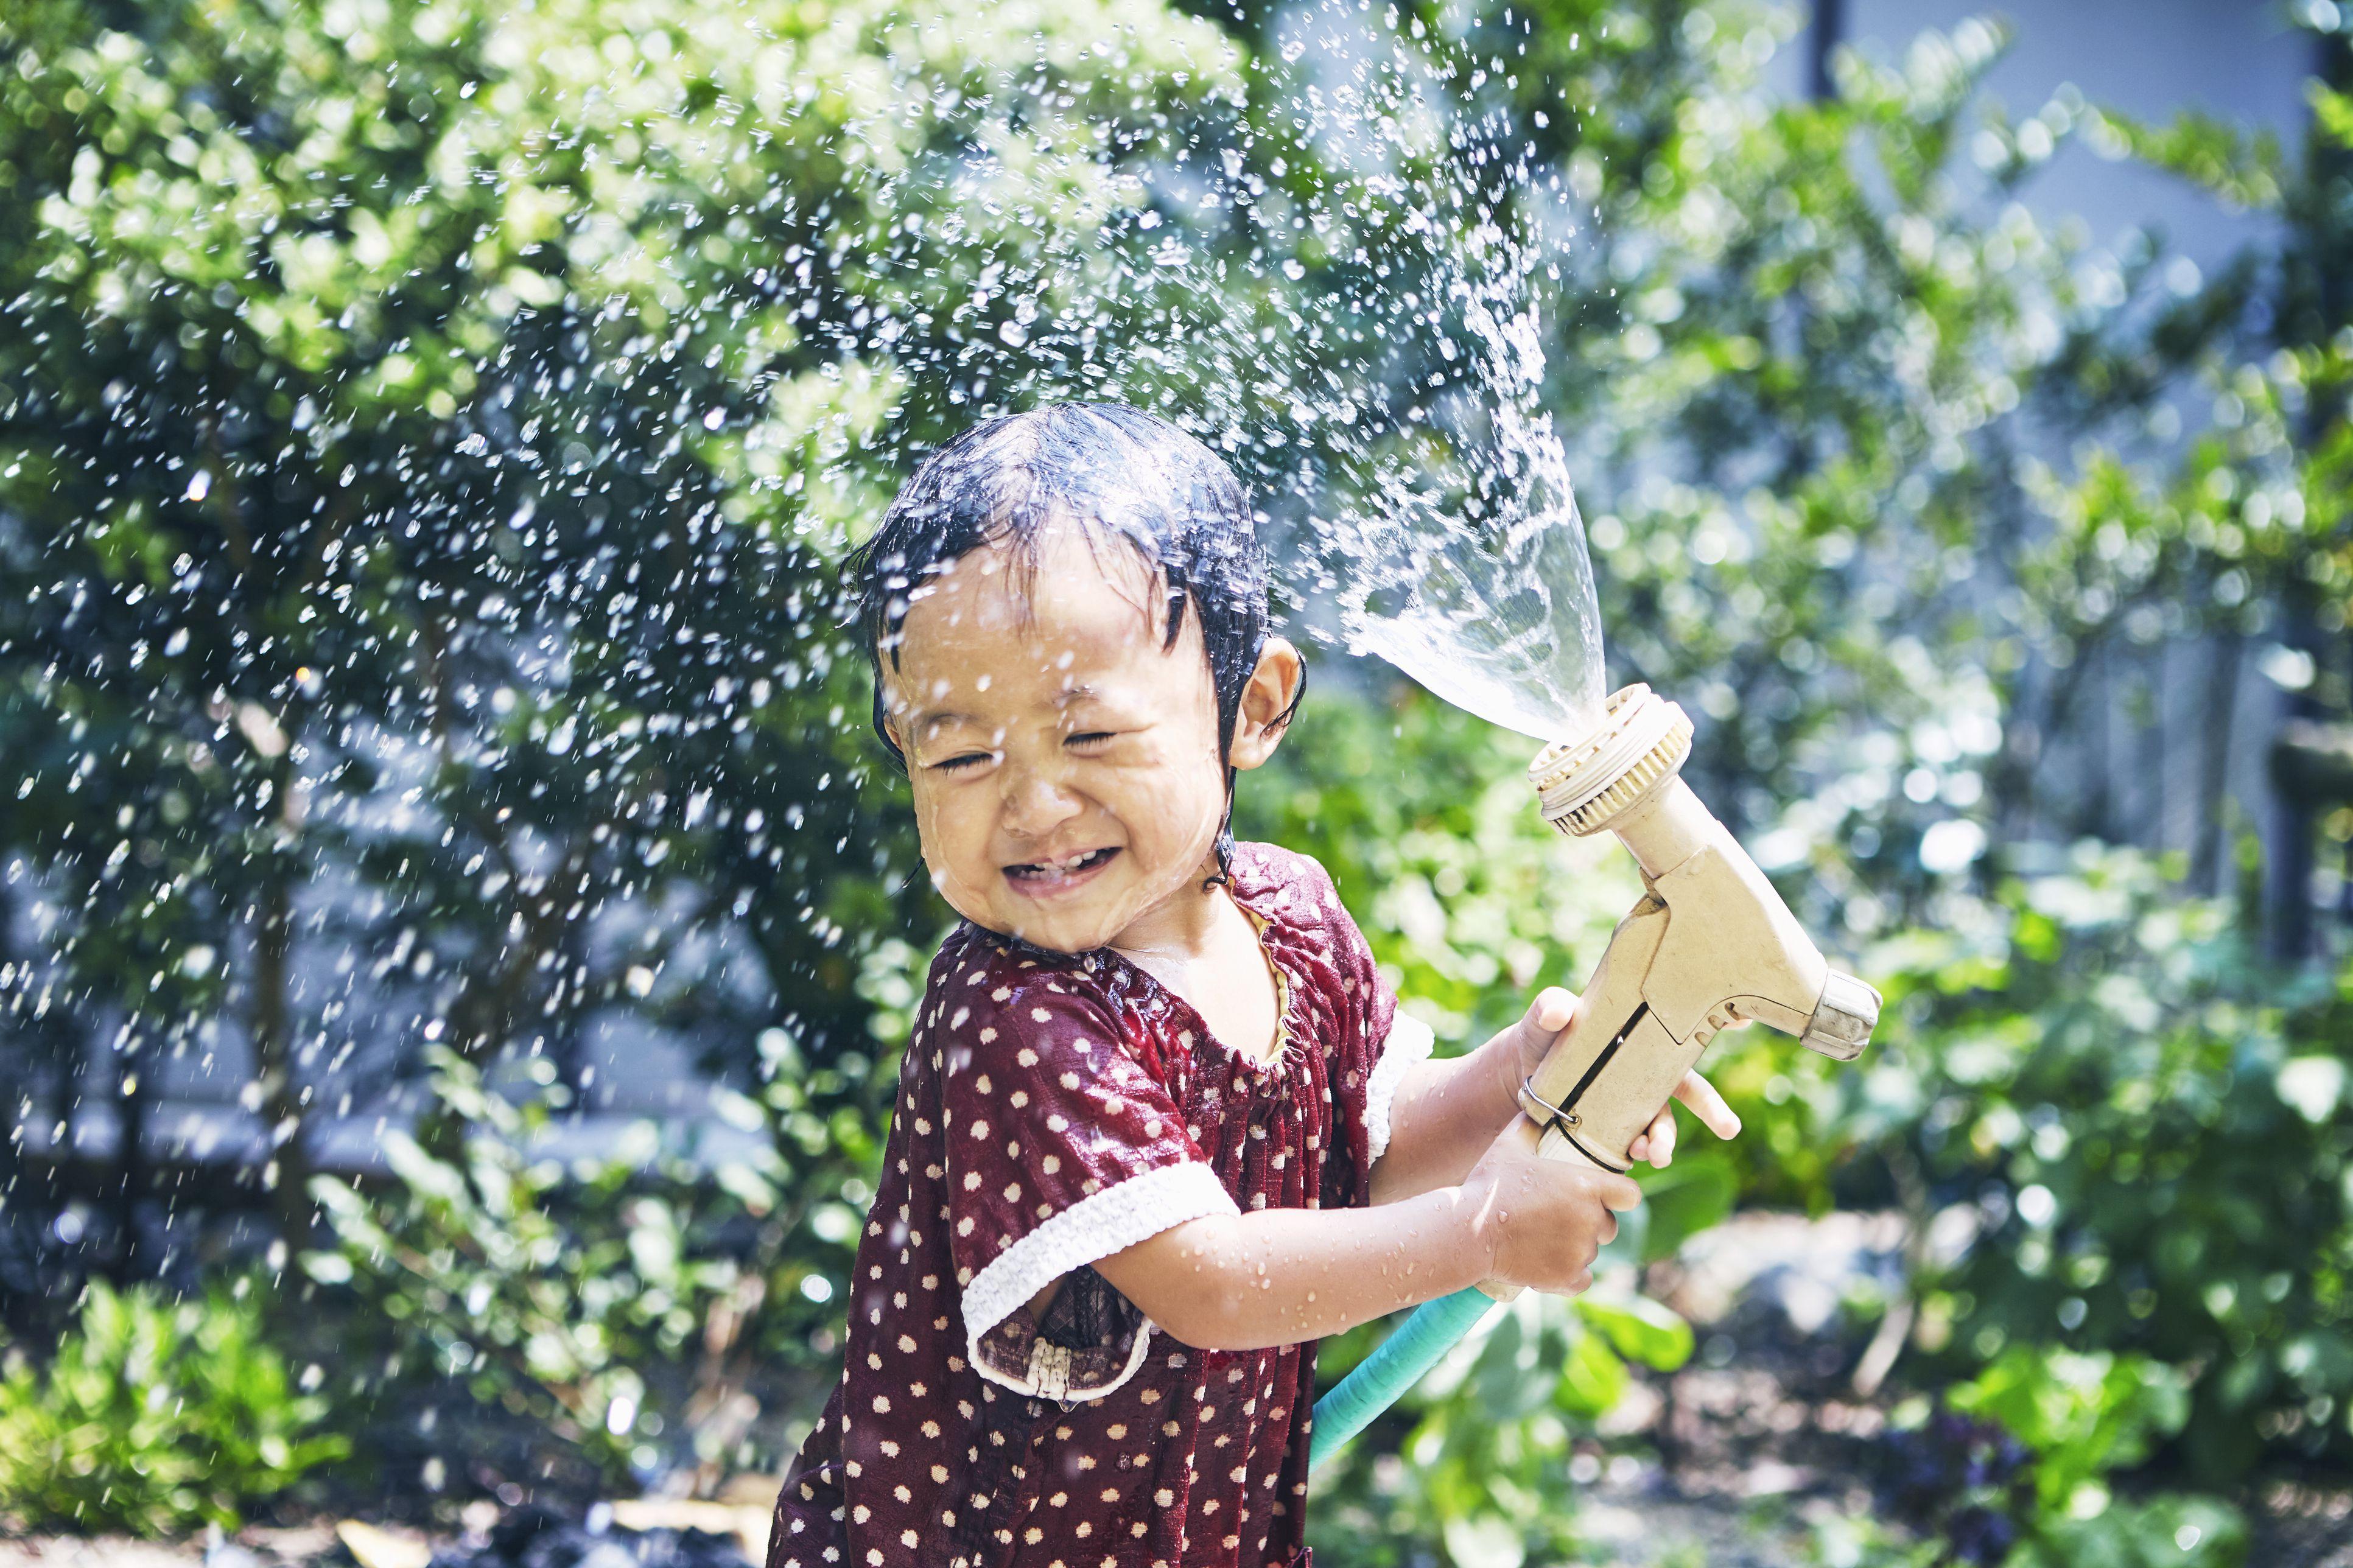 girl fucks water hose